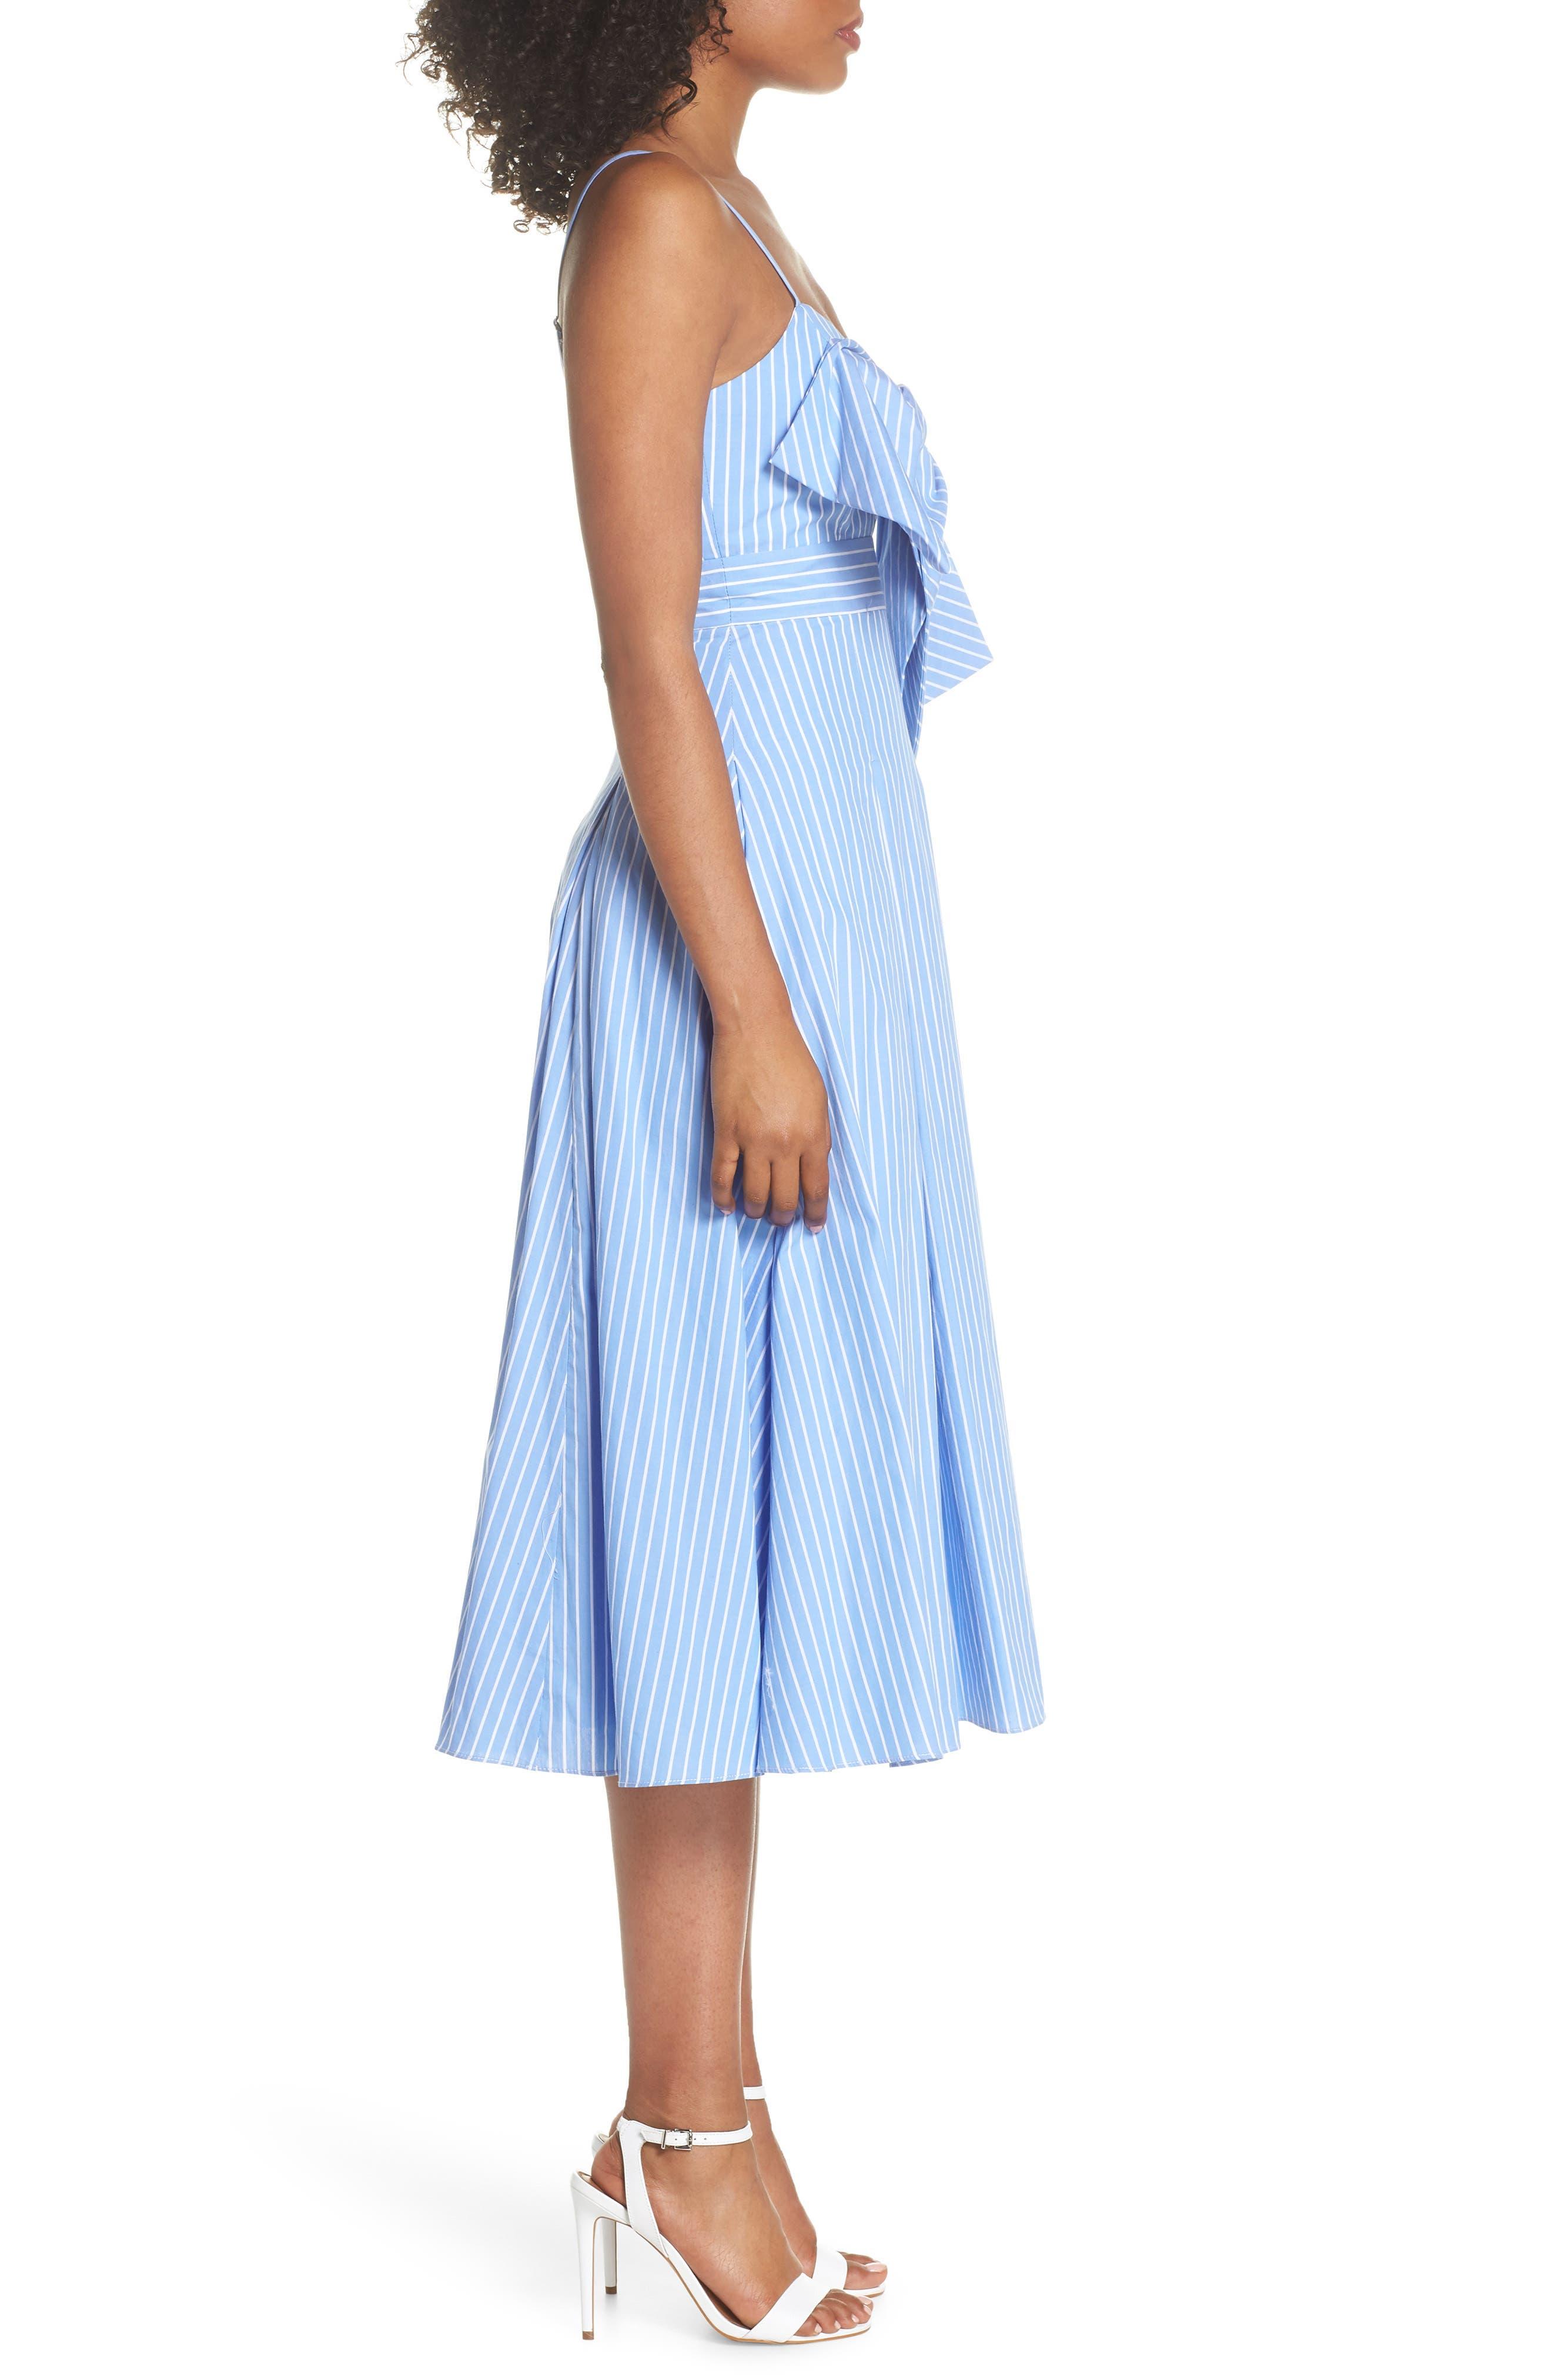 Becky Bow Front Tea Length Dress,                             Alternate thumbnail 3, color,                             Pale Blue/ White Stripe